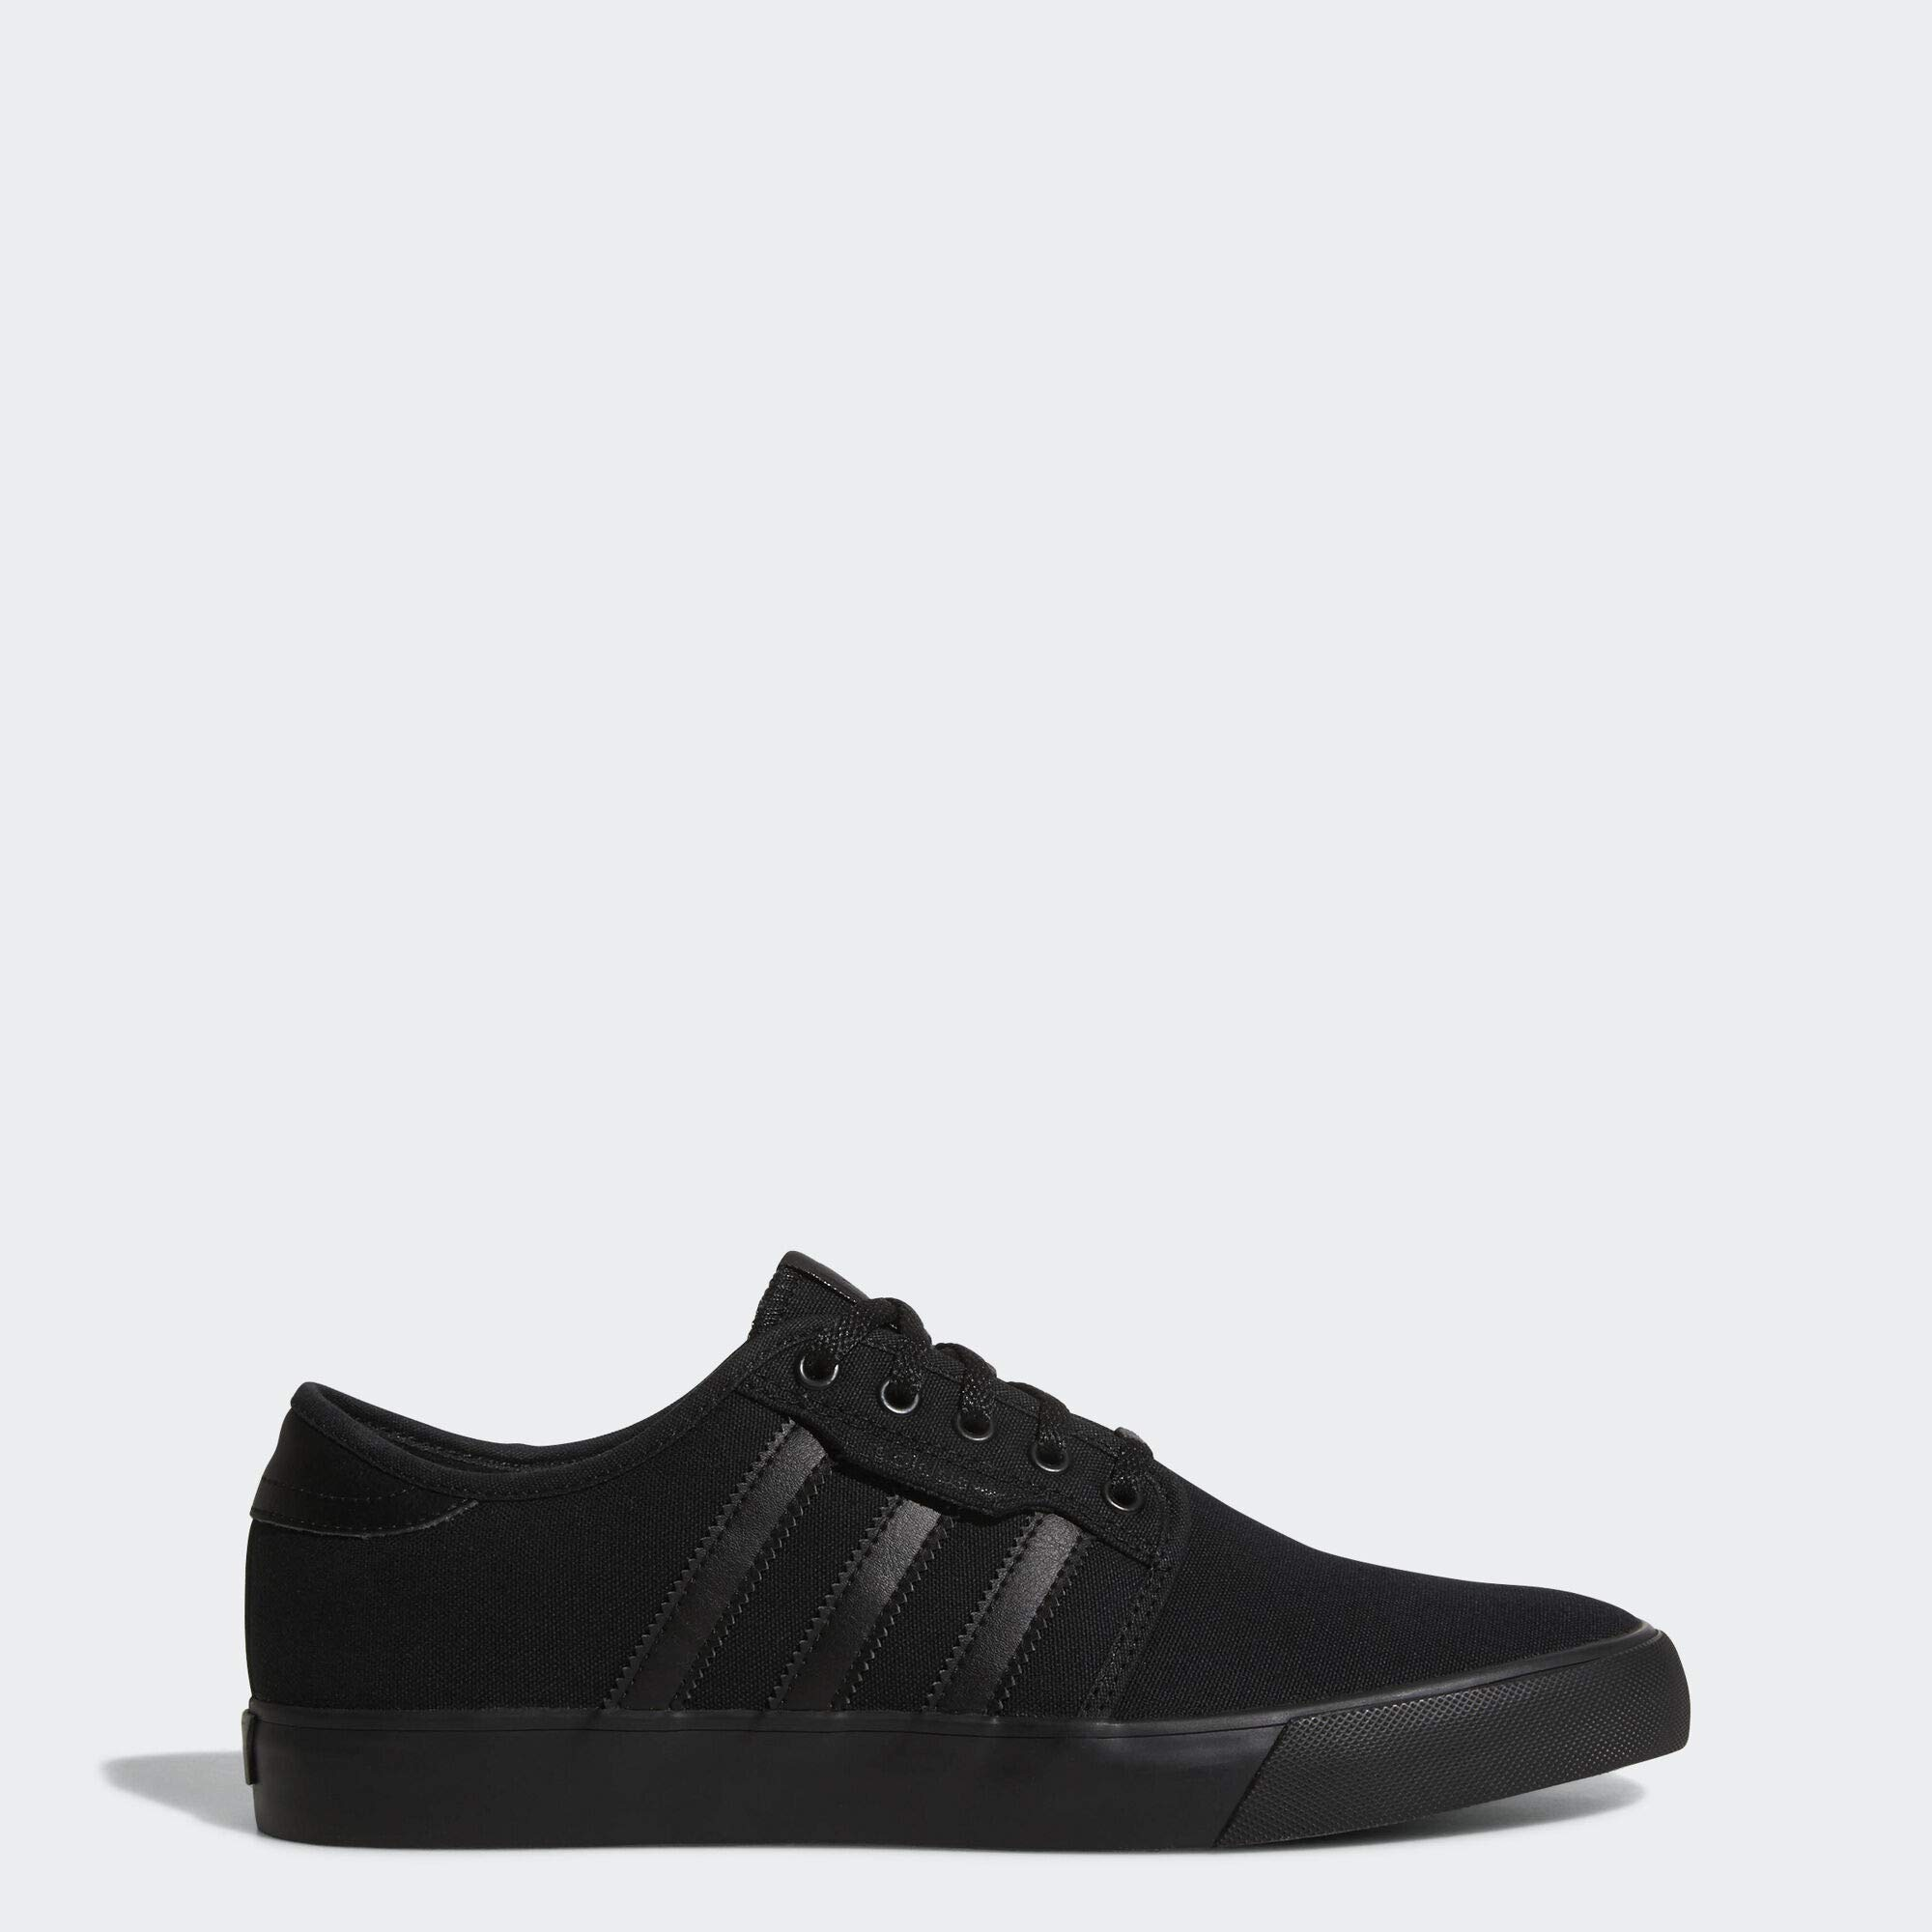 adidas Originals Men's Seeley Running Shoe, Black, 11 M US by adidas Originals